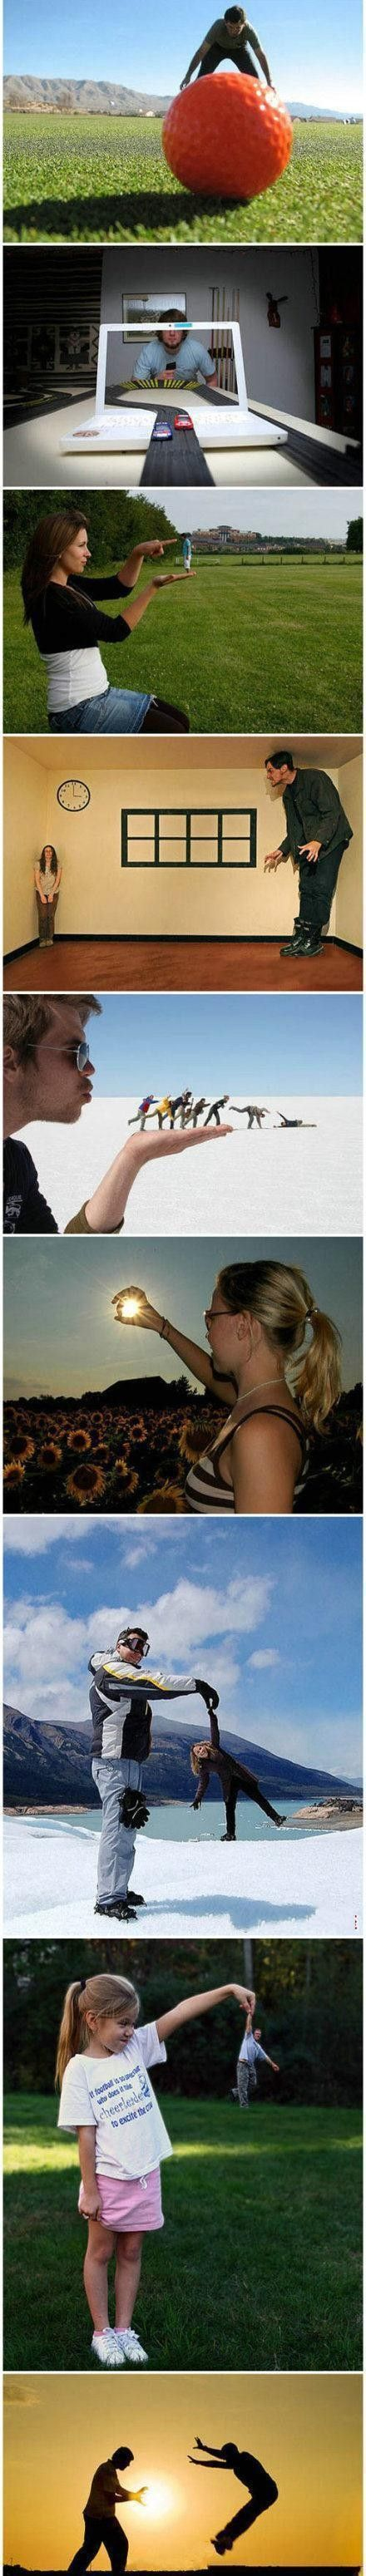 9 perspective photos